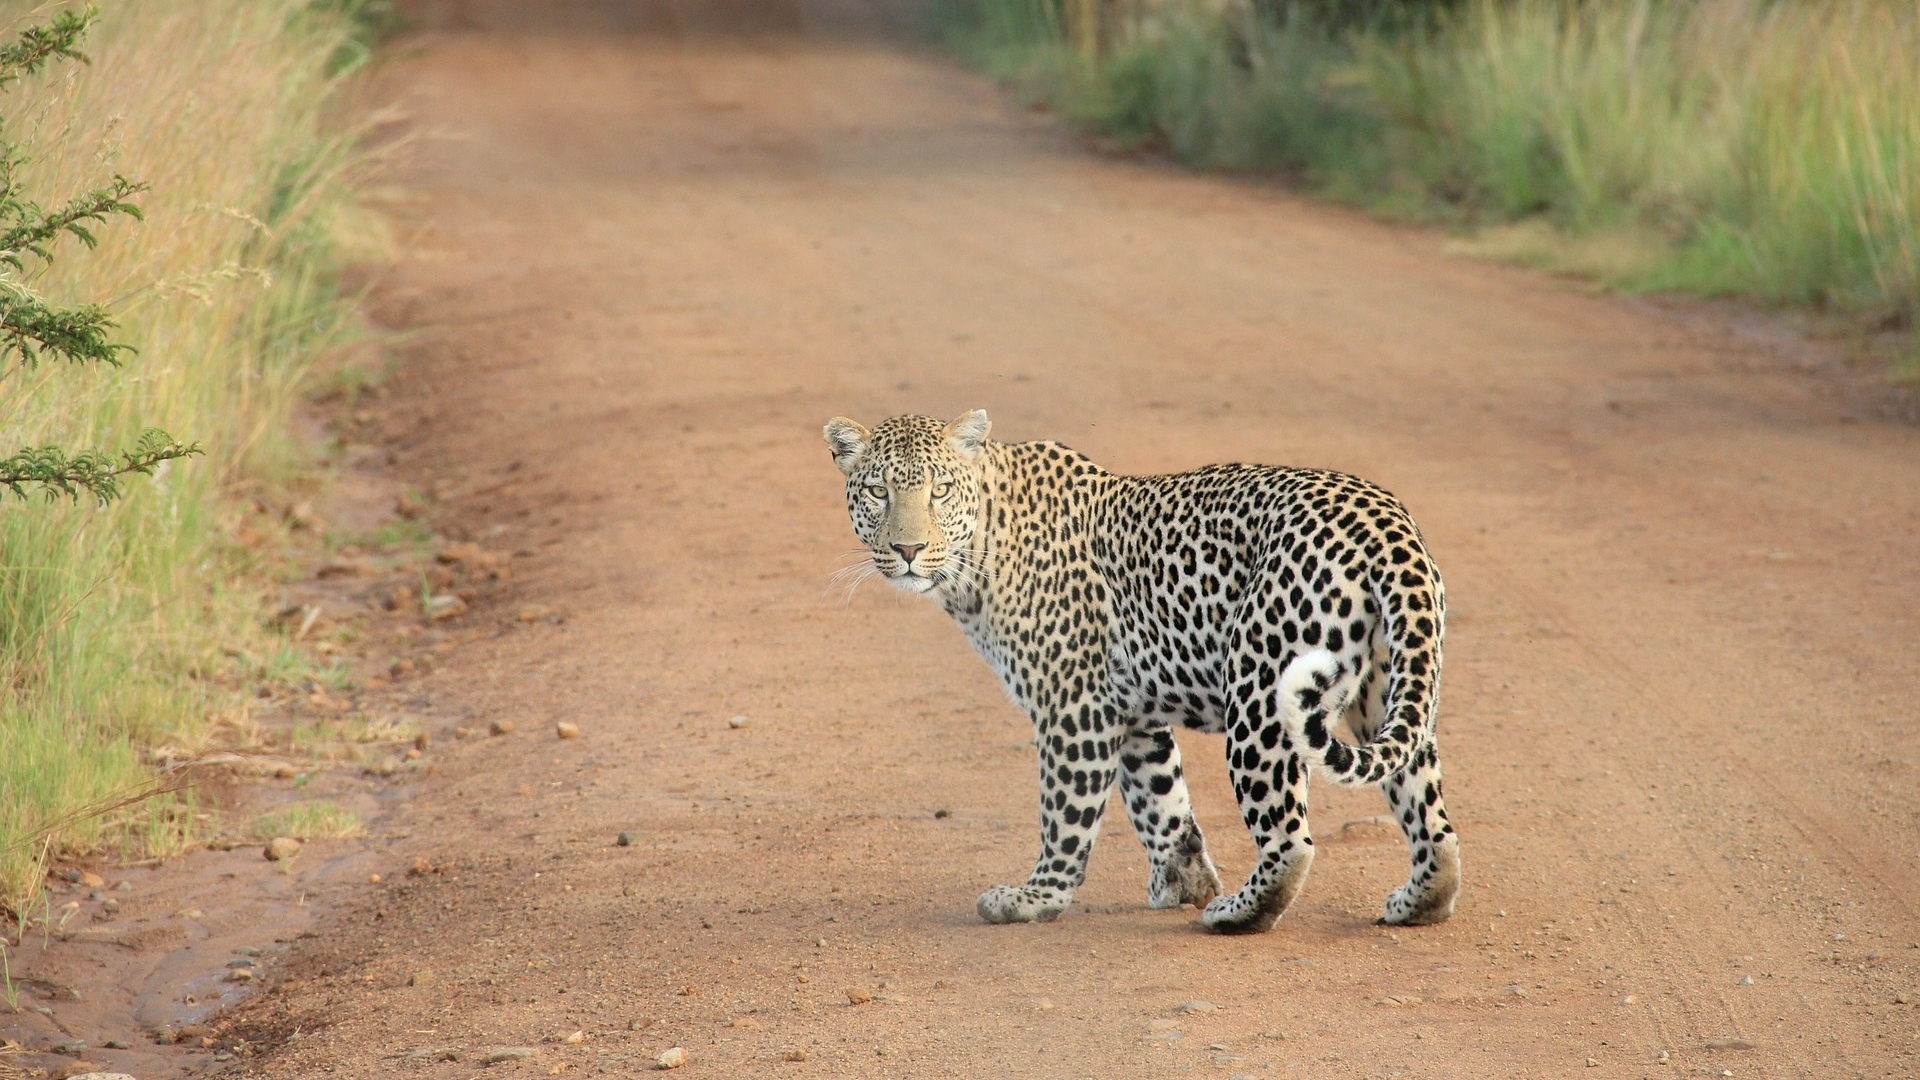 leopard-336604_1920